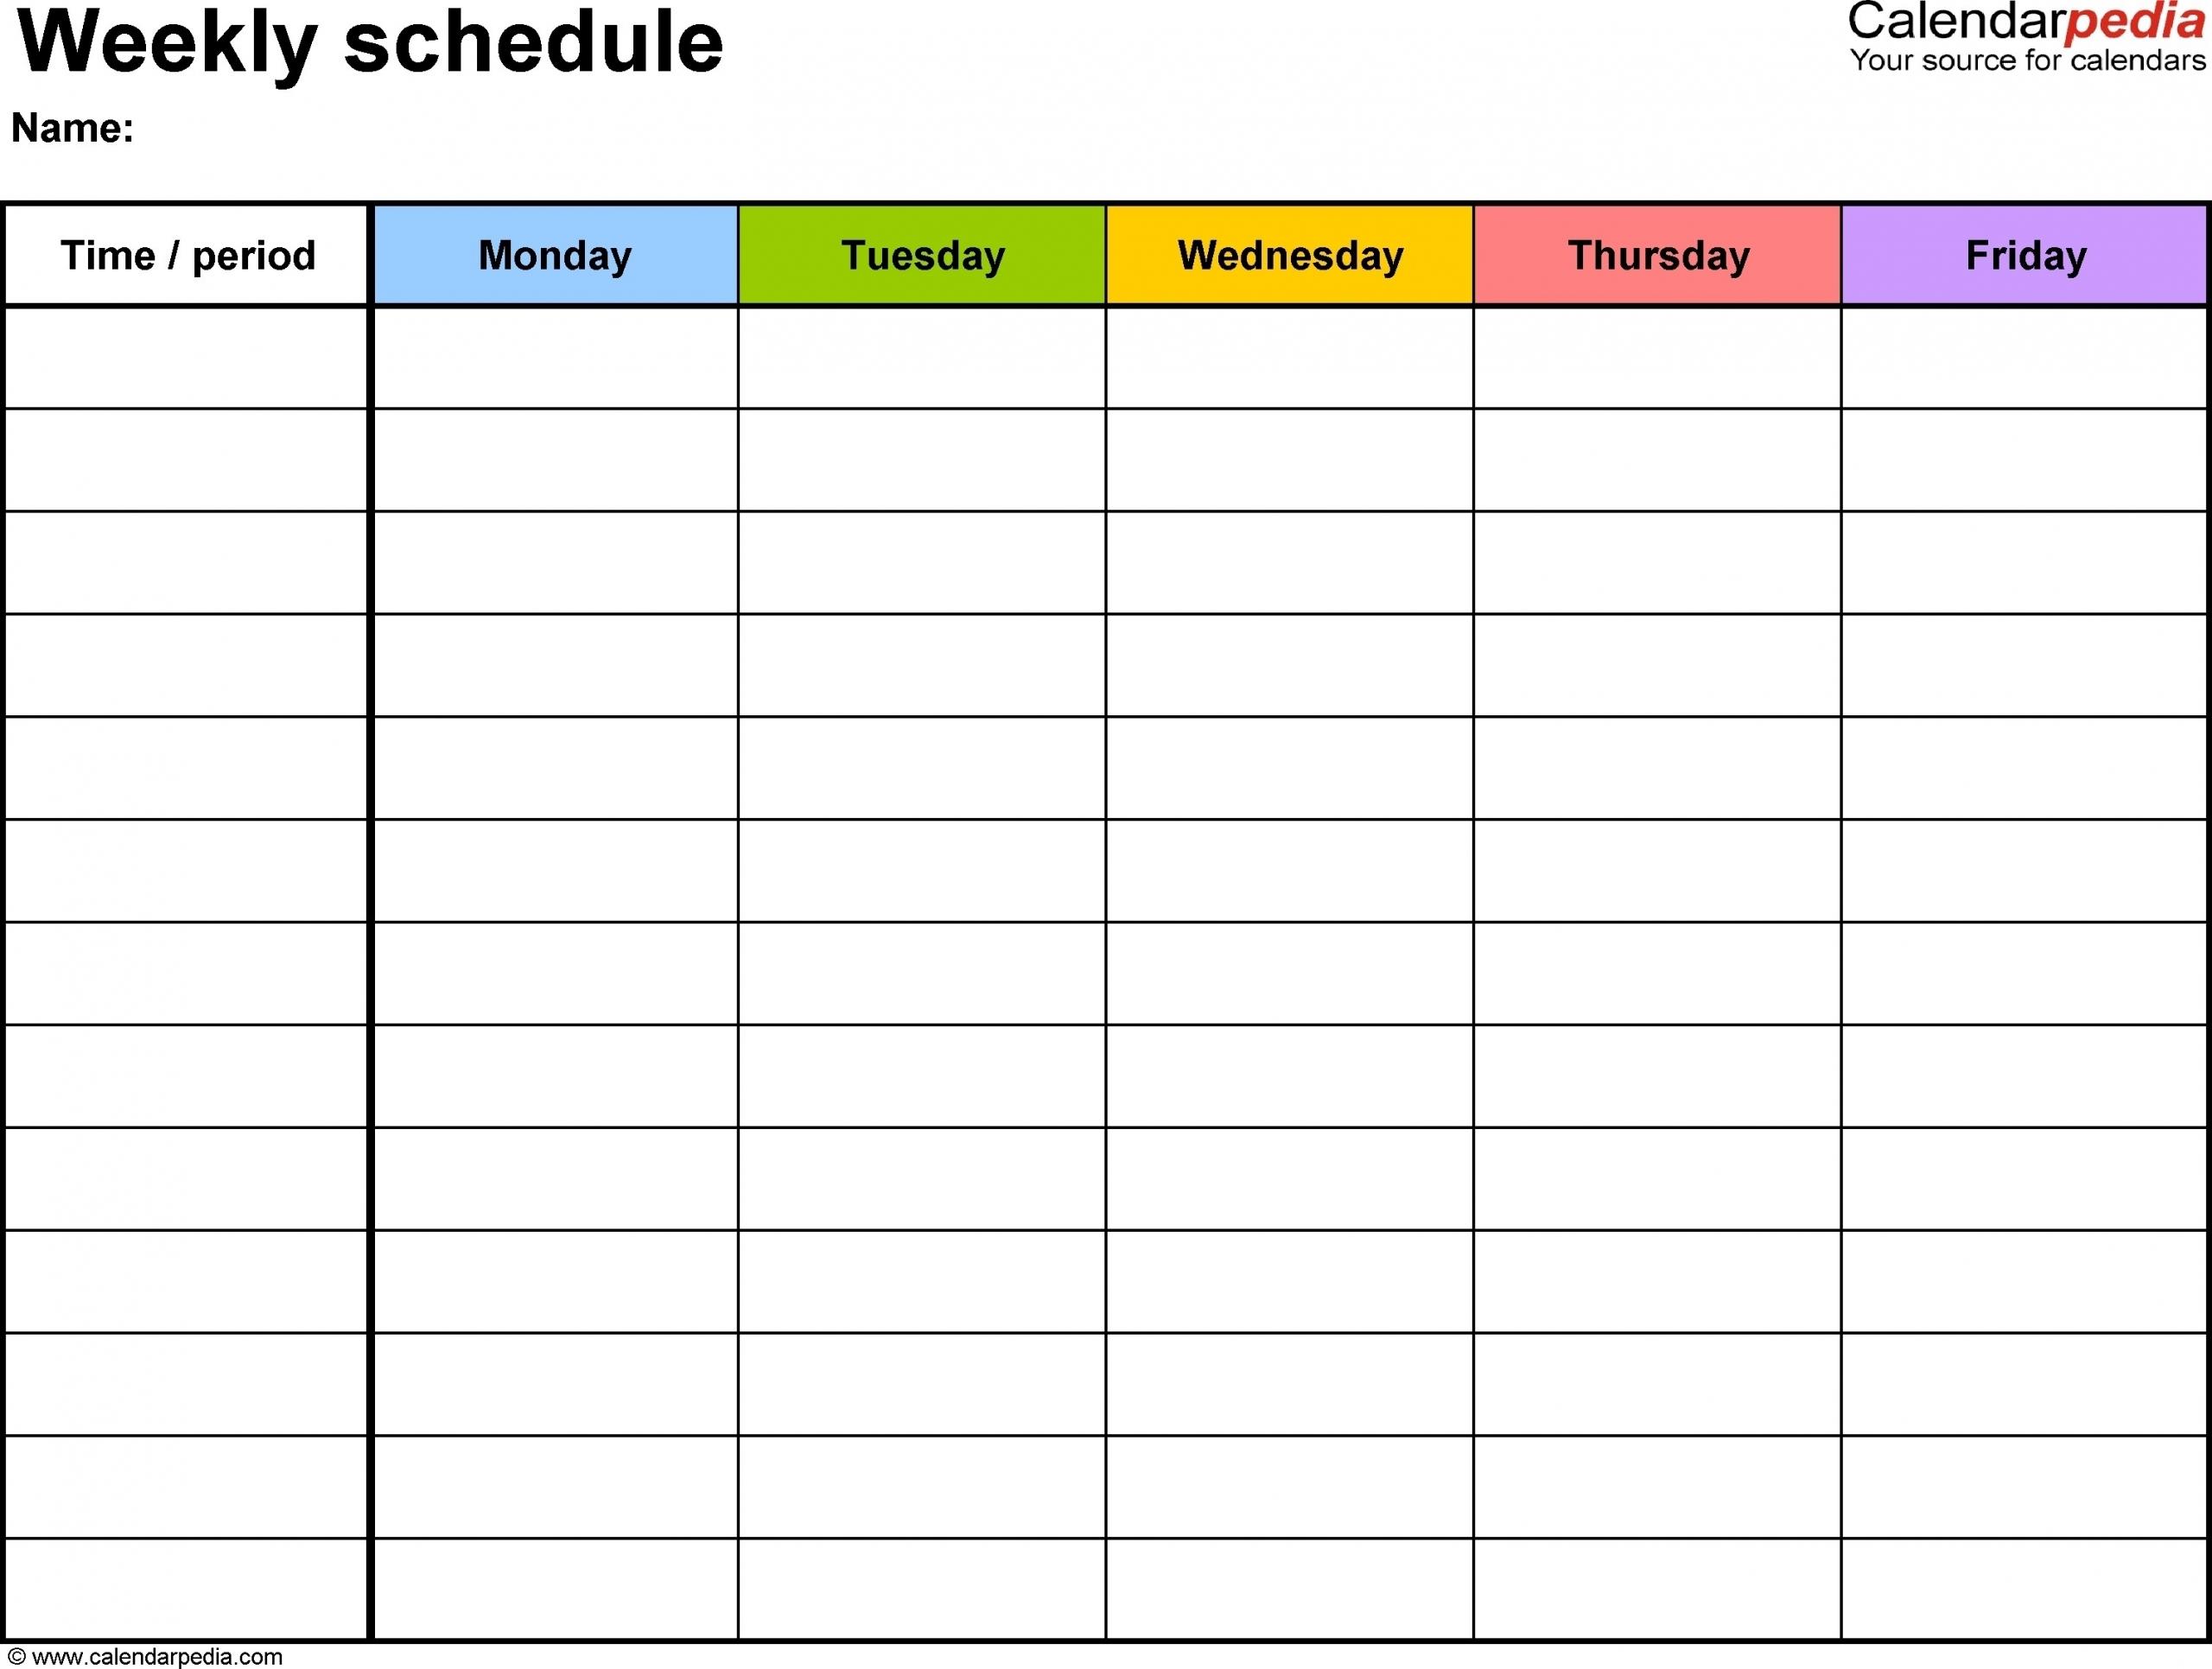 Weekly Calendar With Time Slots | Ten Free Printable